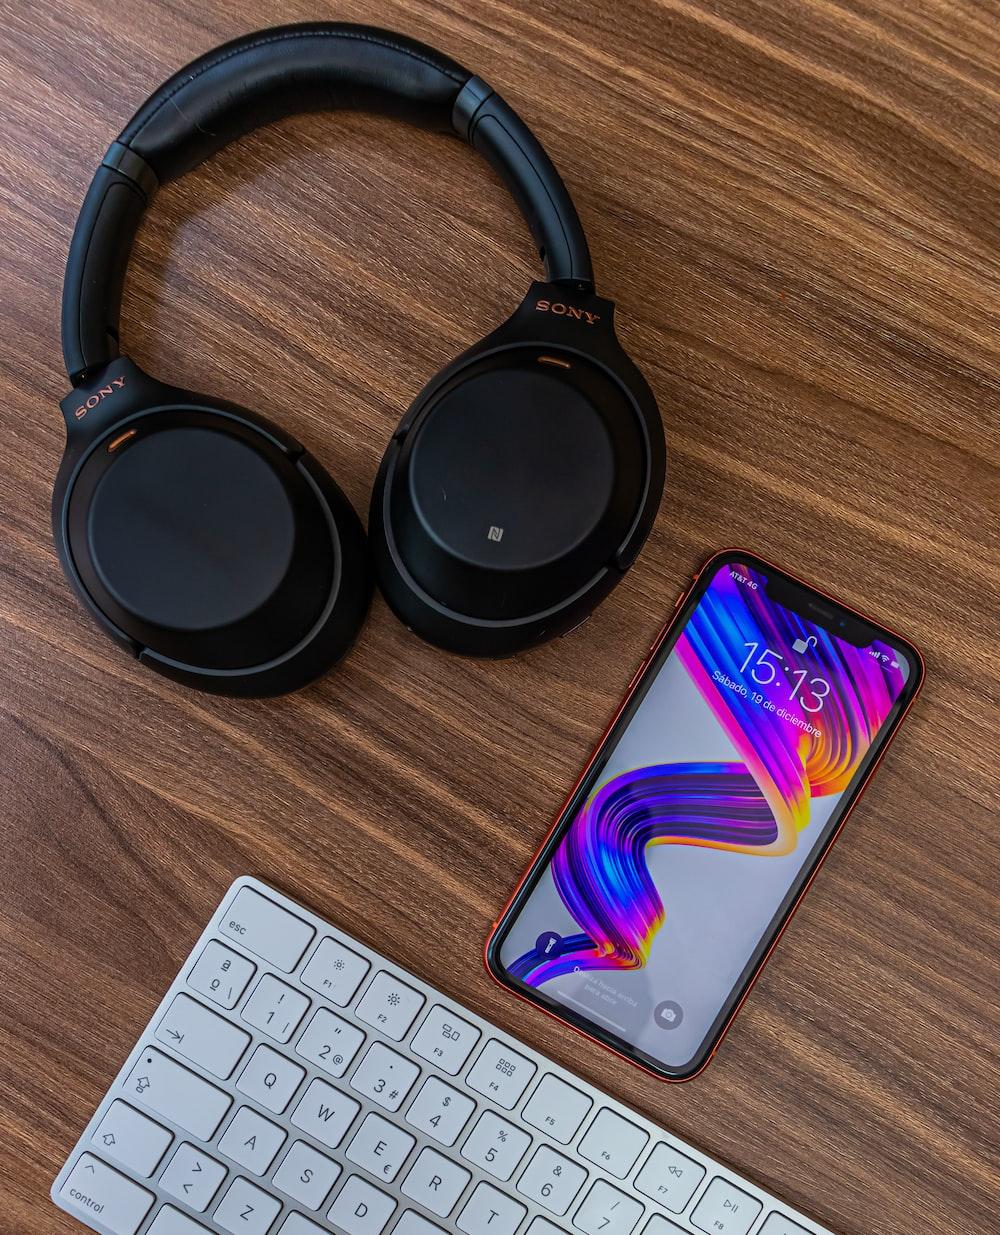 black and purple headphones beside white computer keyboard